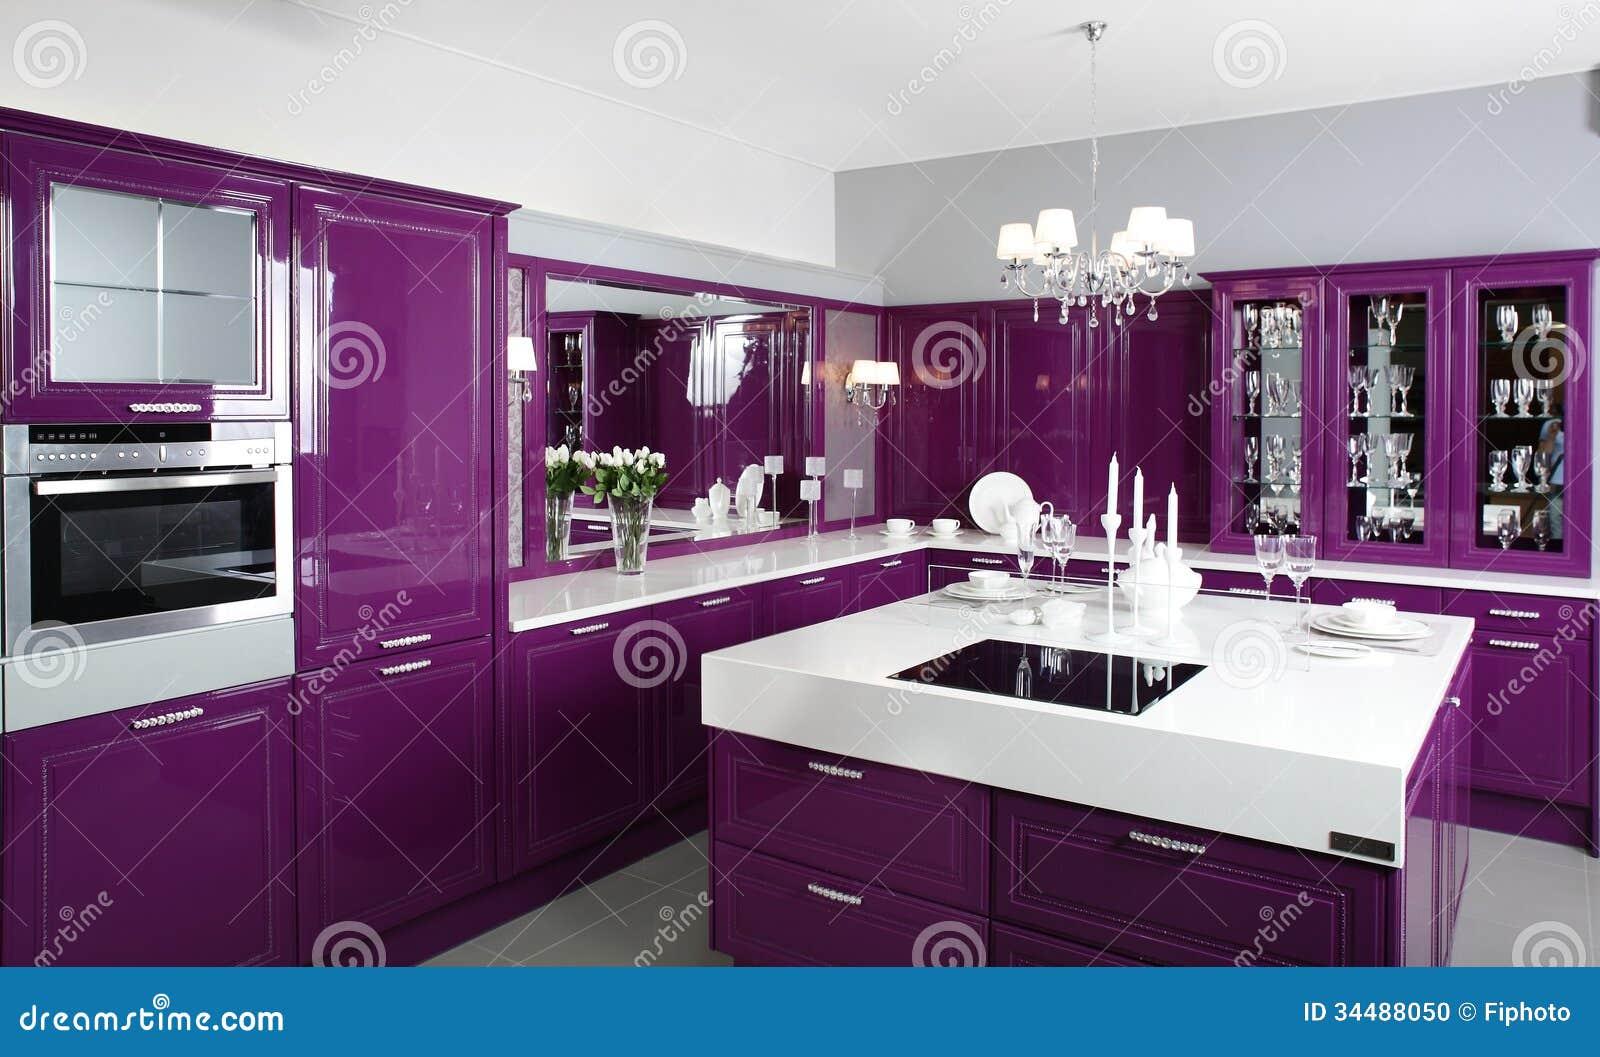 Kitchen Furniture Clipart  ARCHDSGN